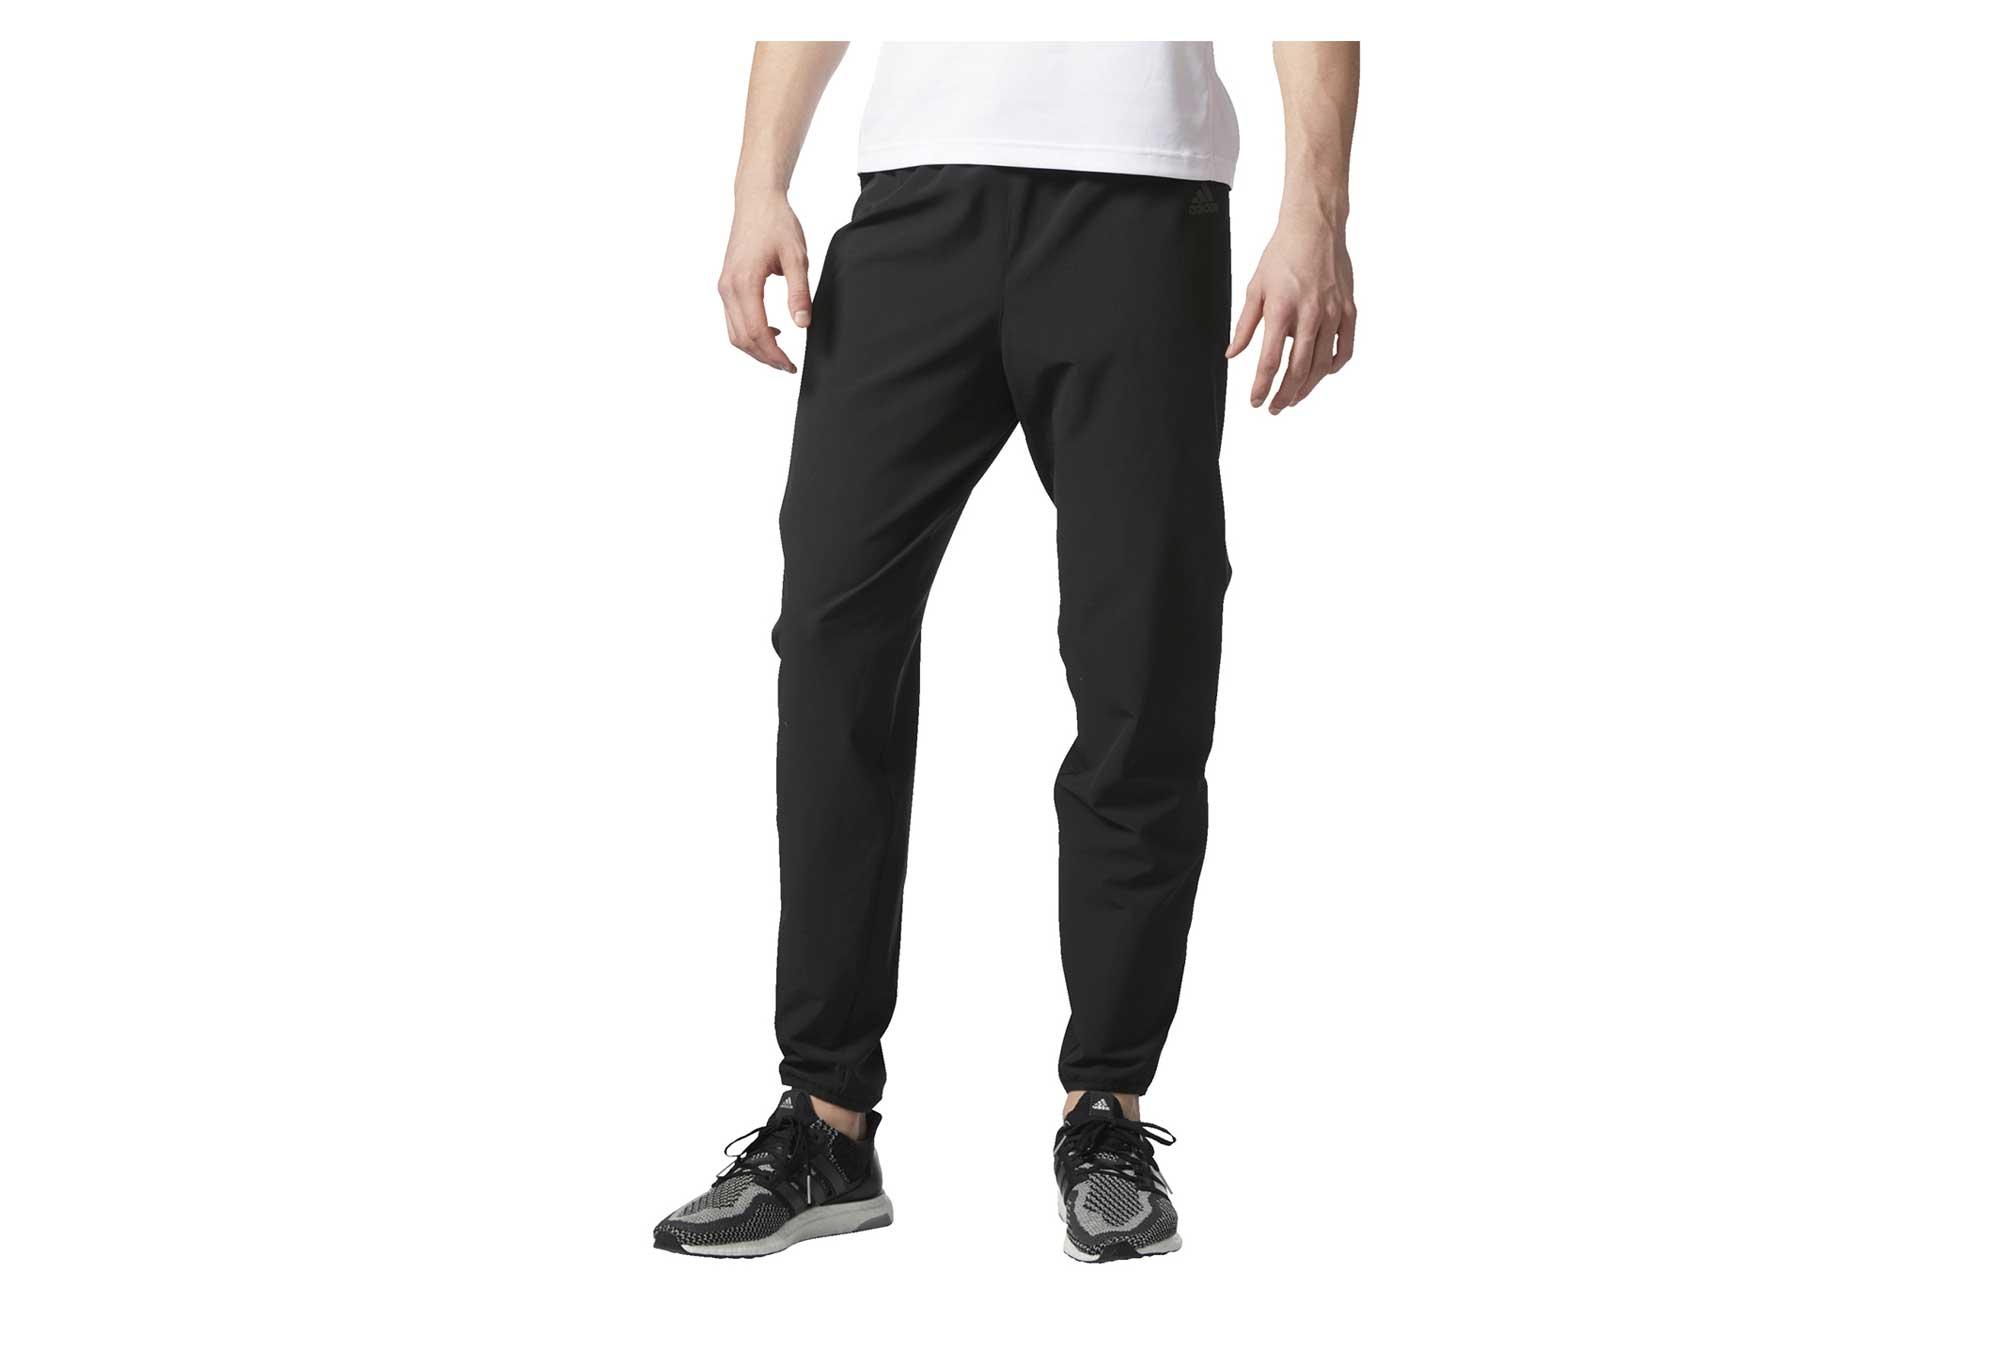 lowest price 3d13f 176ef Pantalon de Sport adidas running Response Shell Noir